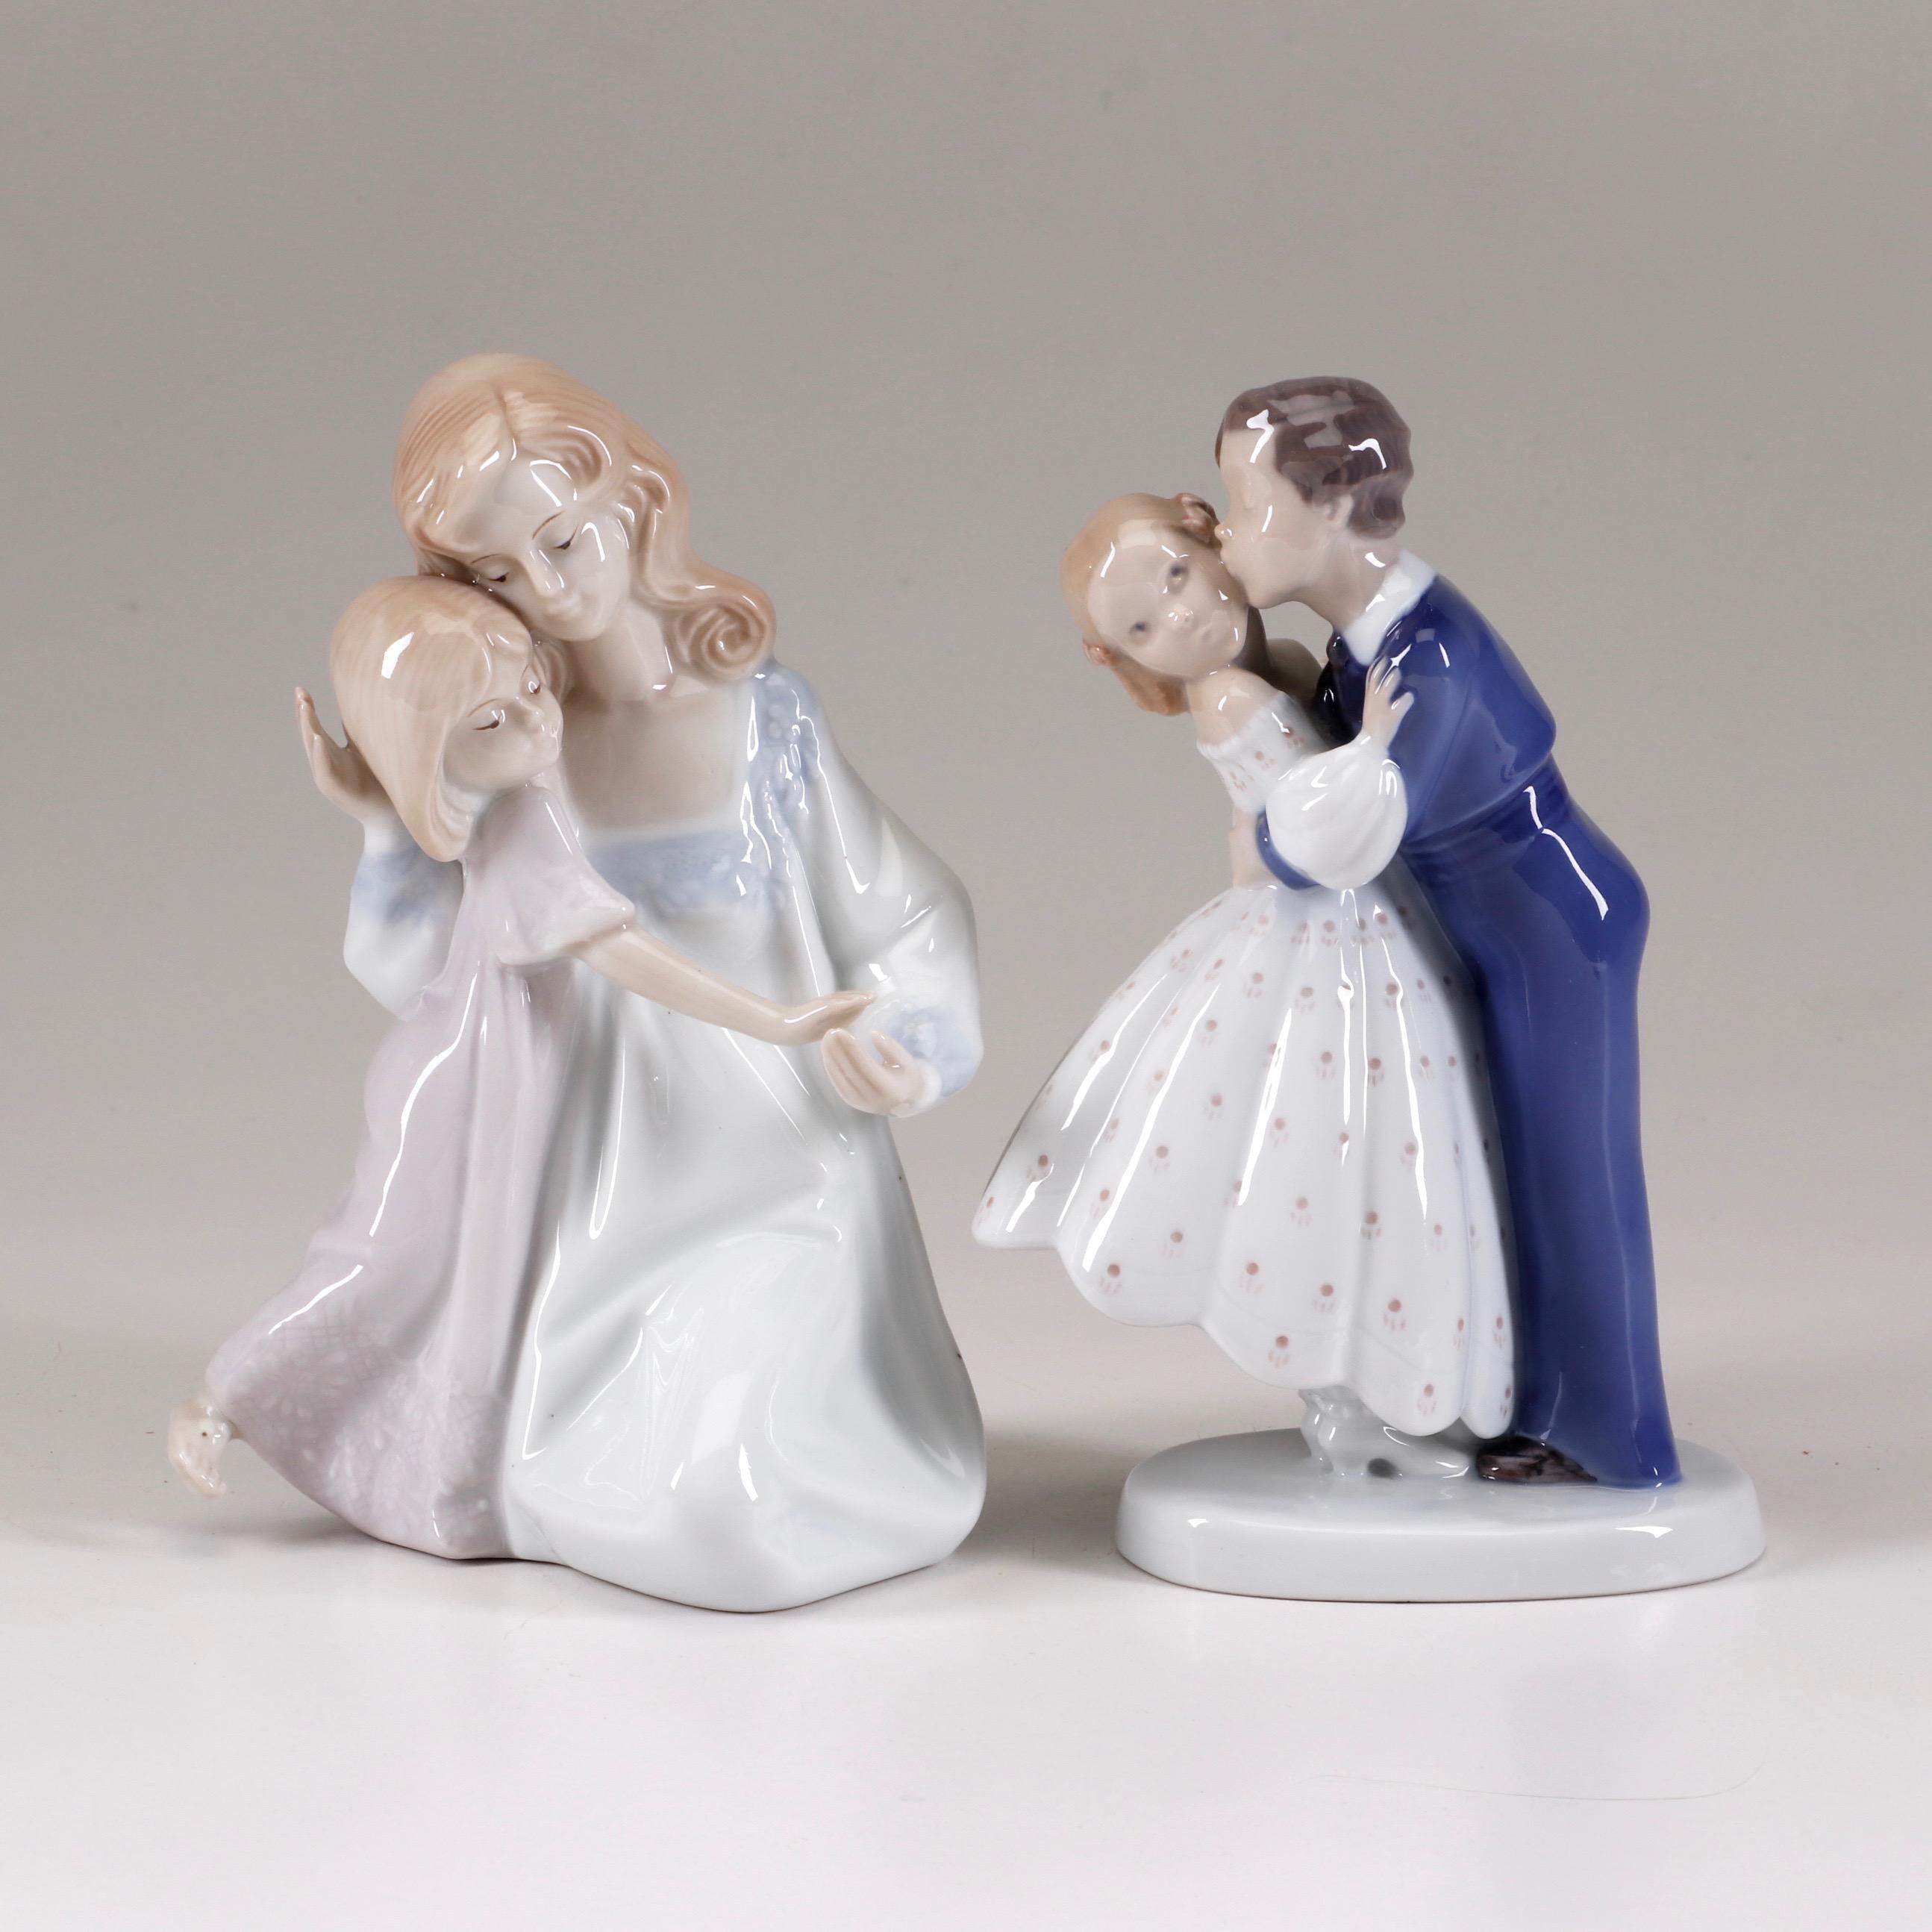 Porcelain Figurines Featuring Royal Copenhagen